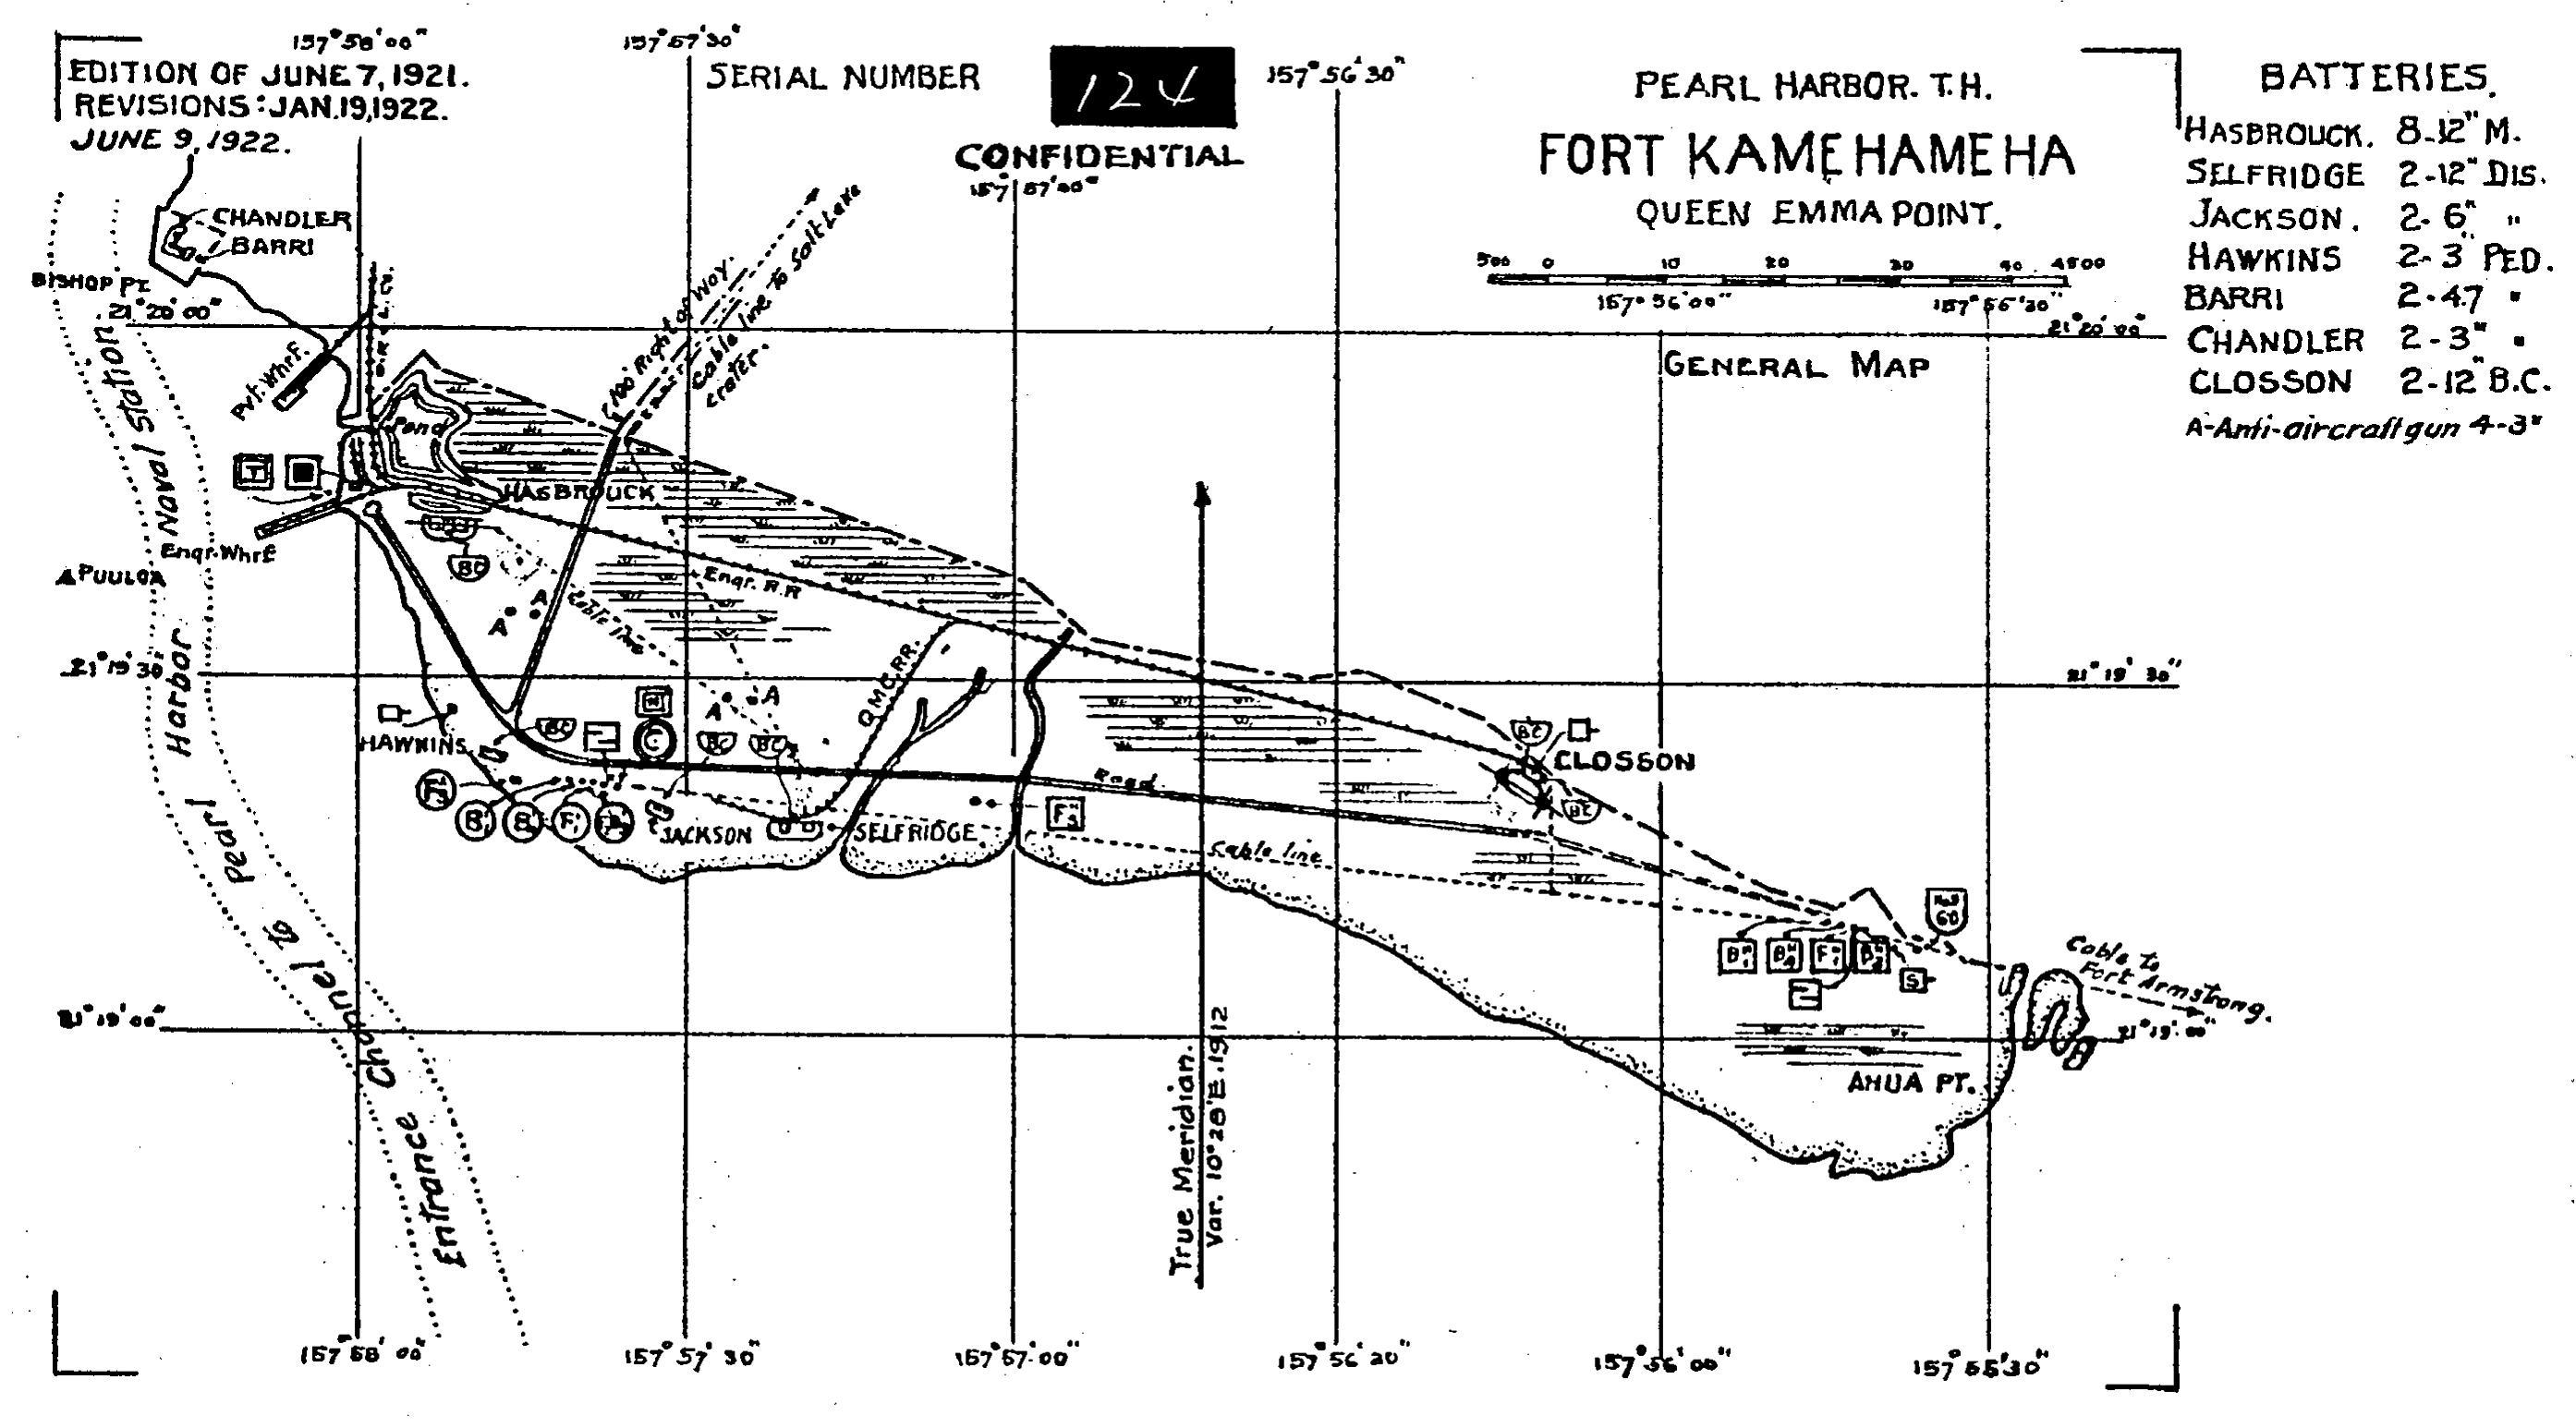 Map Diagram Of The Coastal Batteries Of Fort Kamehameha